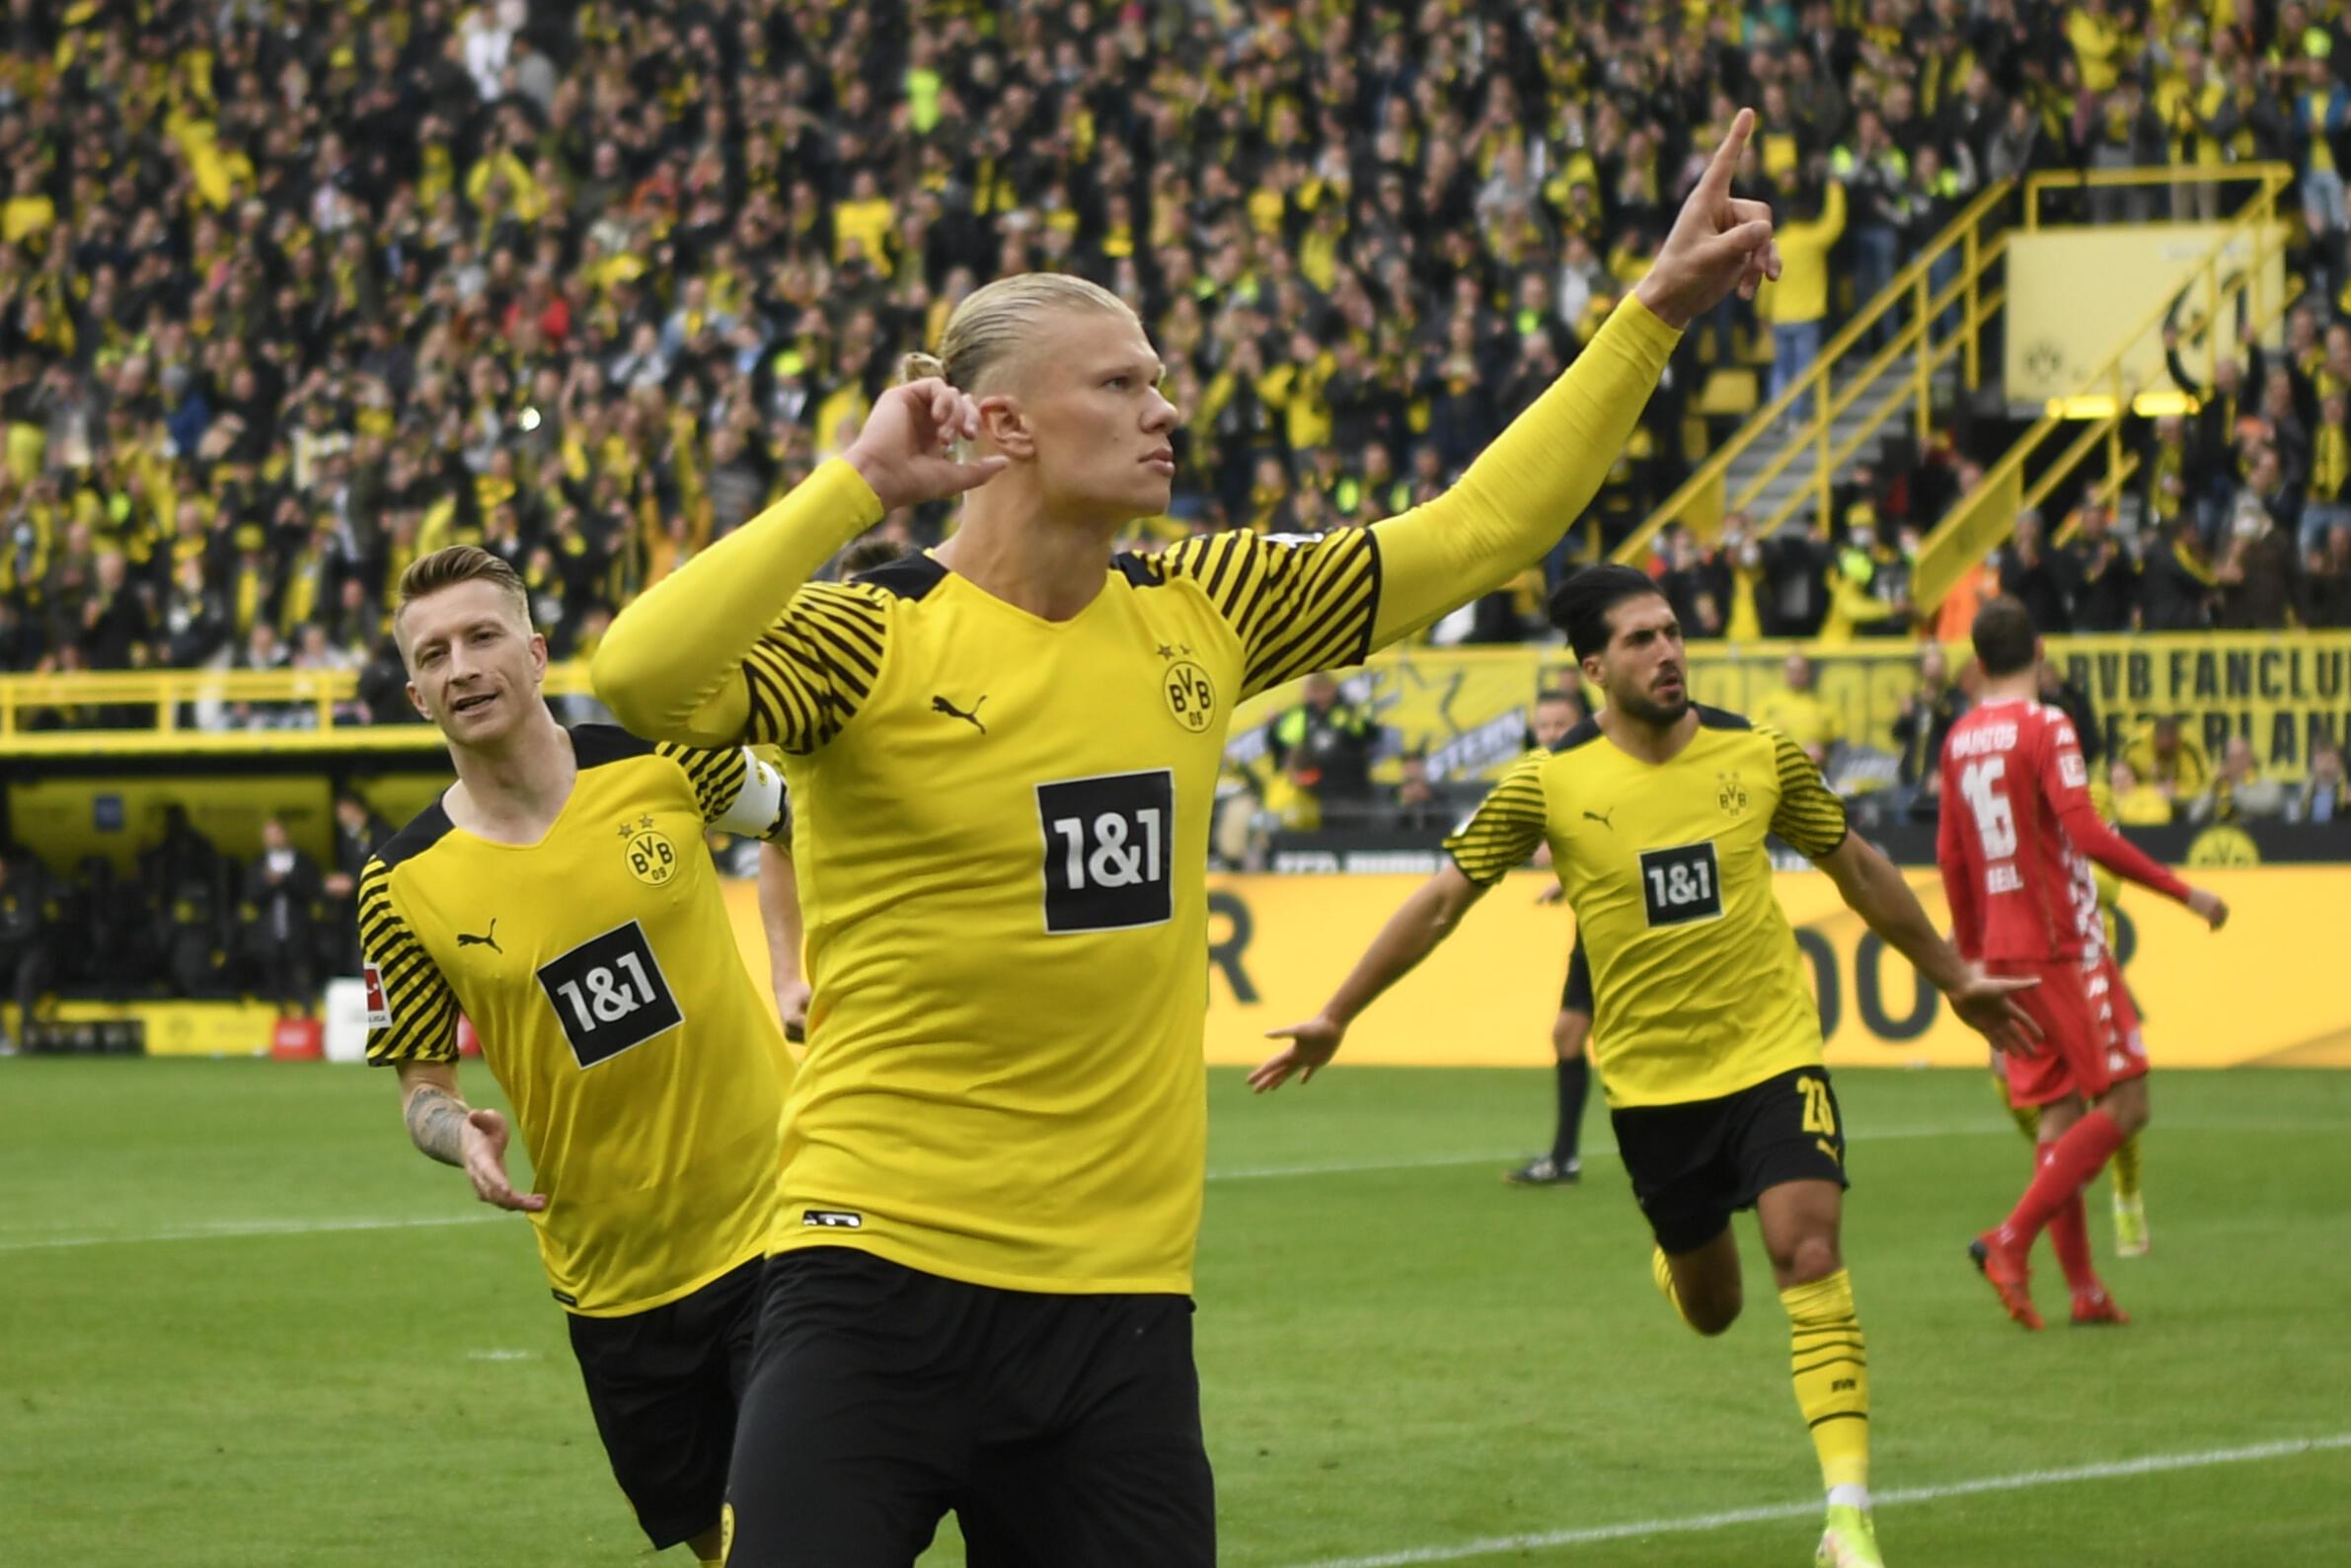 Erling Haaland scored on his return from injury as Borussia Dortmund beat Mainz on Saturday